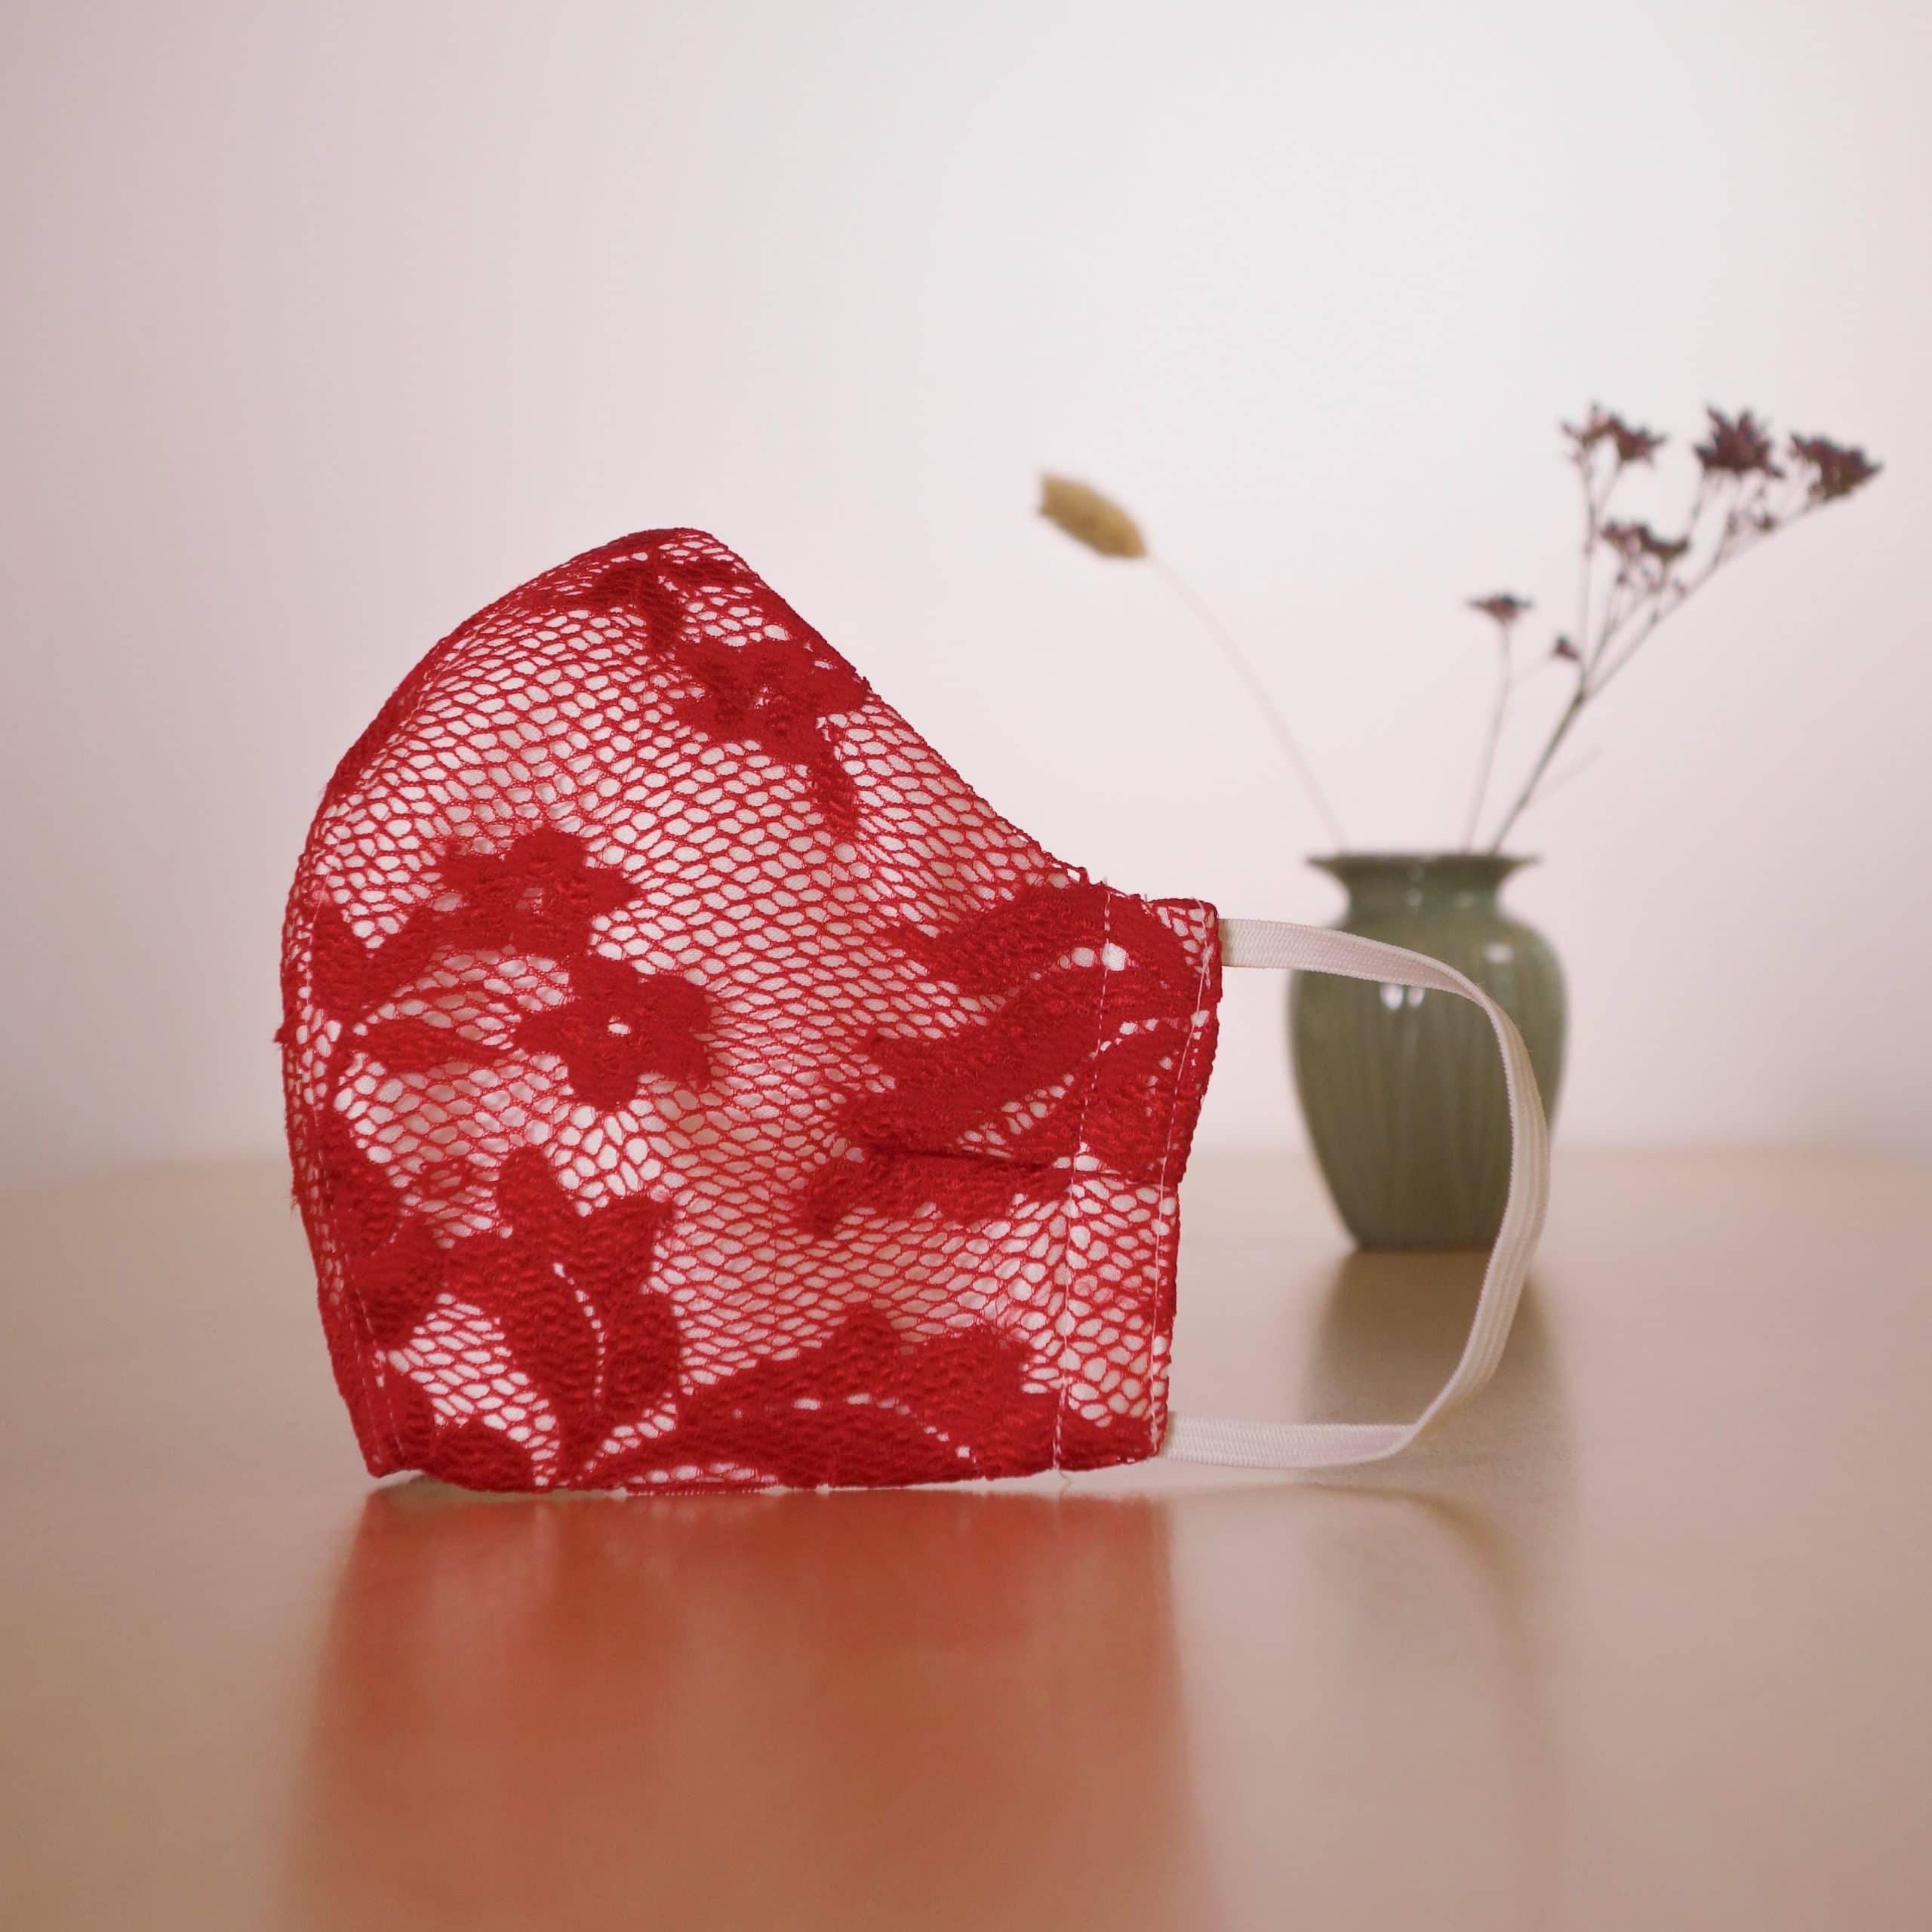 mondkapje-8-rood-kant-amiga-2